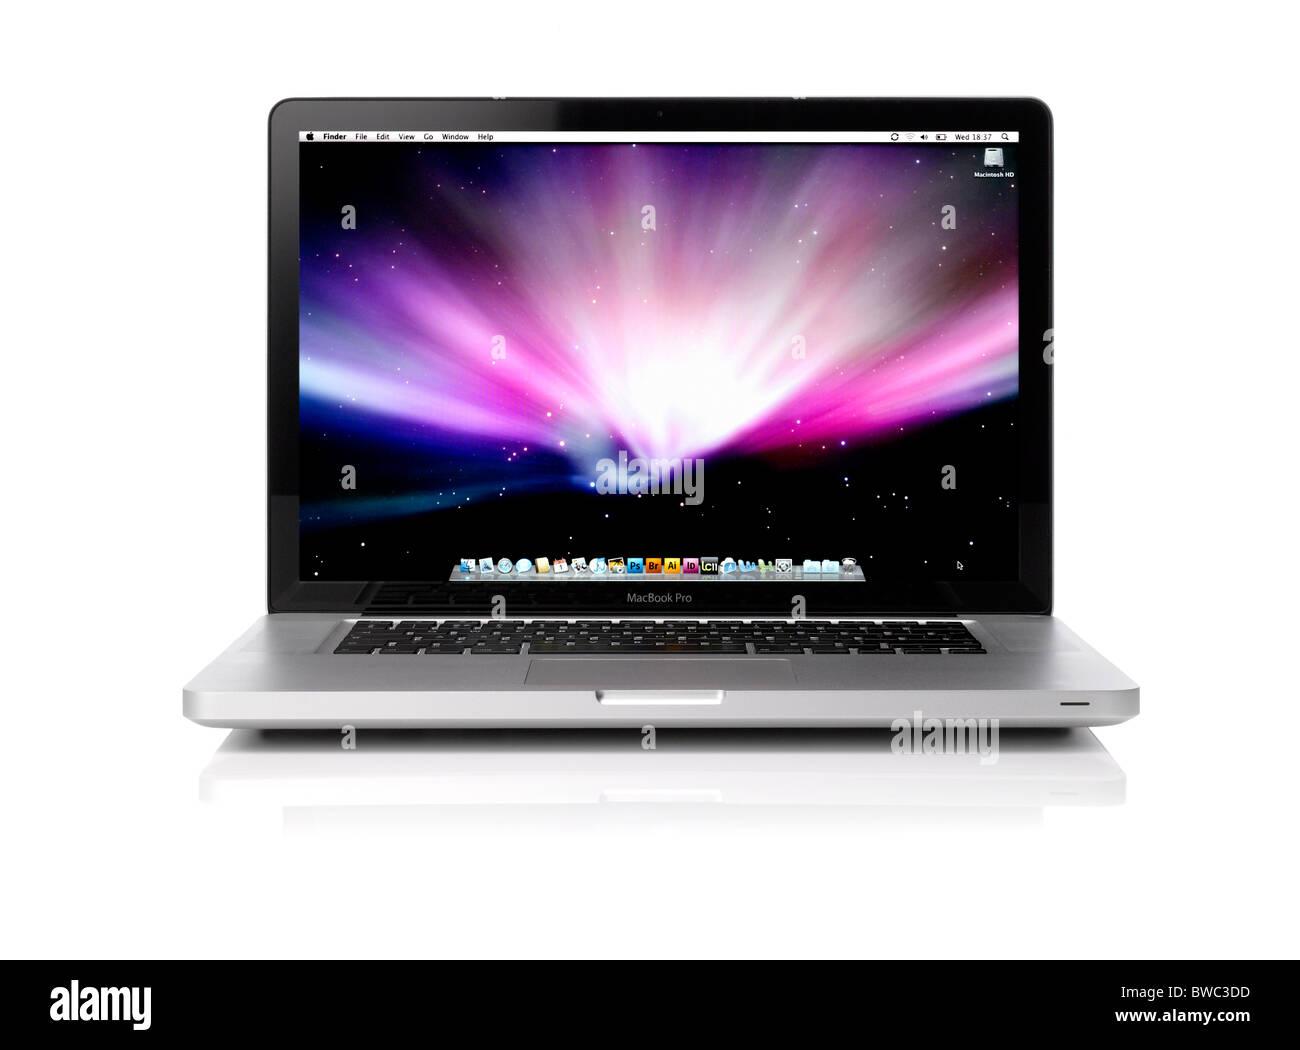 An open Apple laptop computer - Stock Image